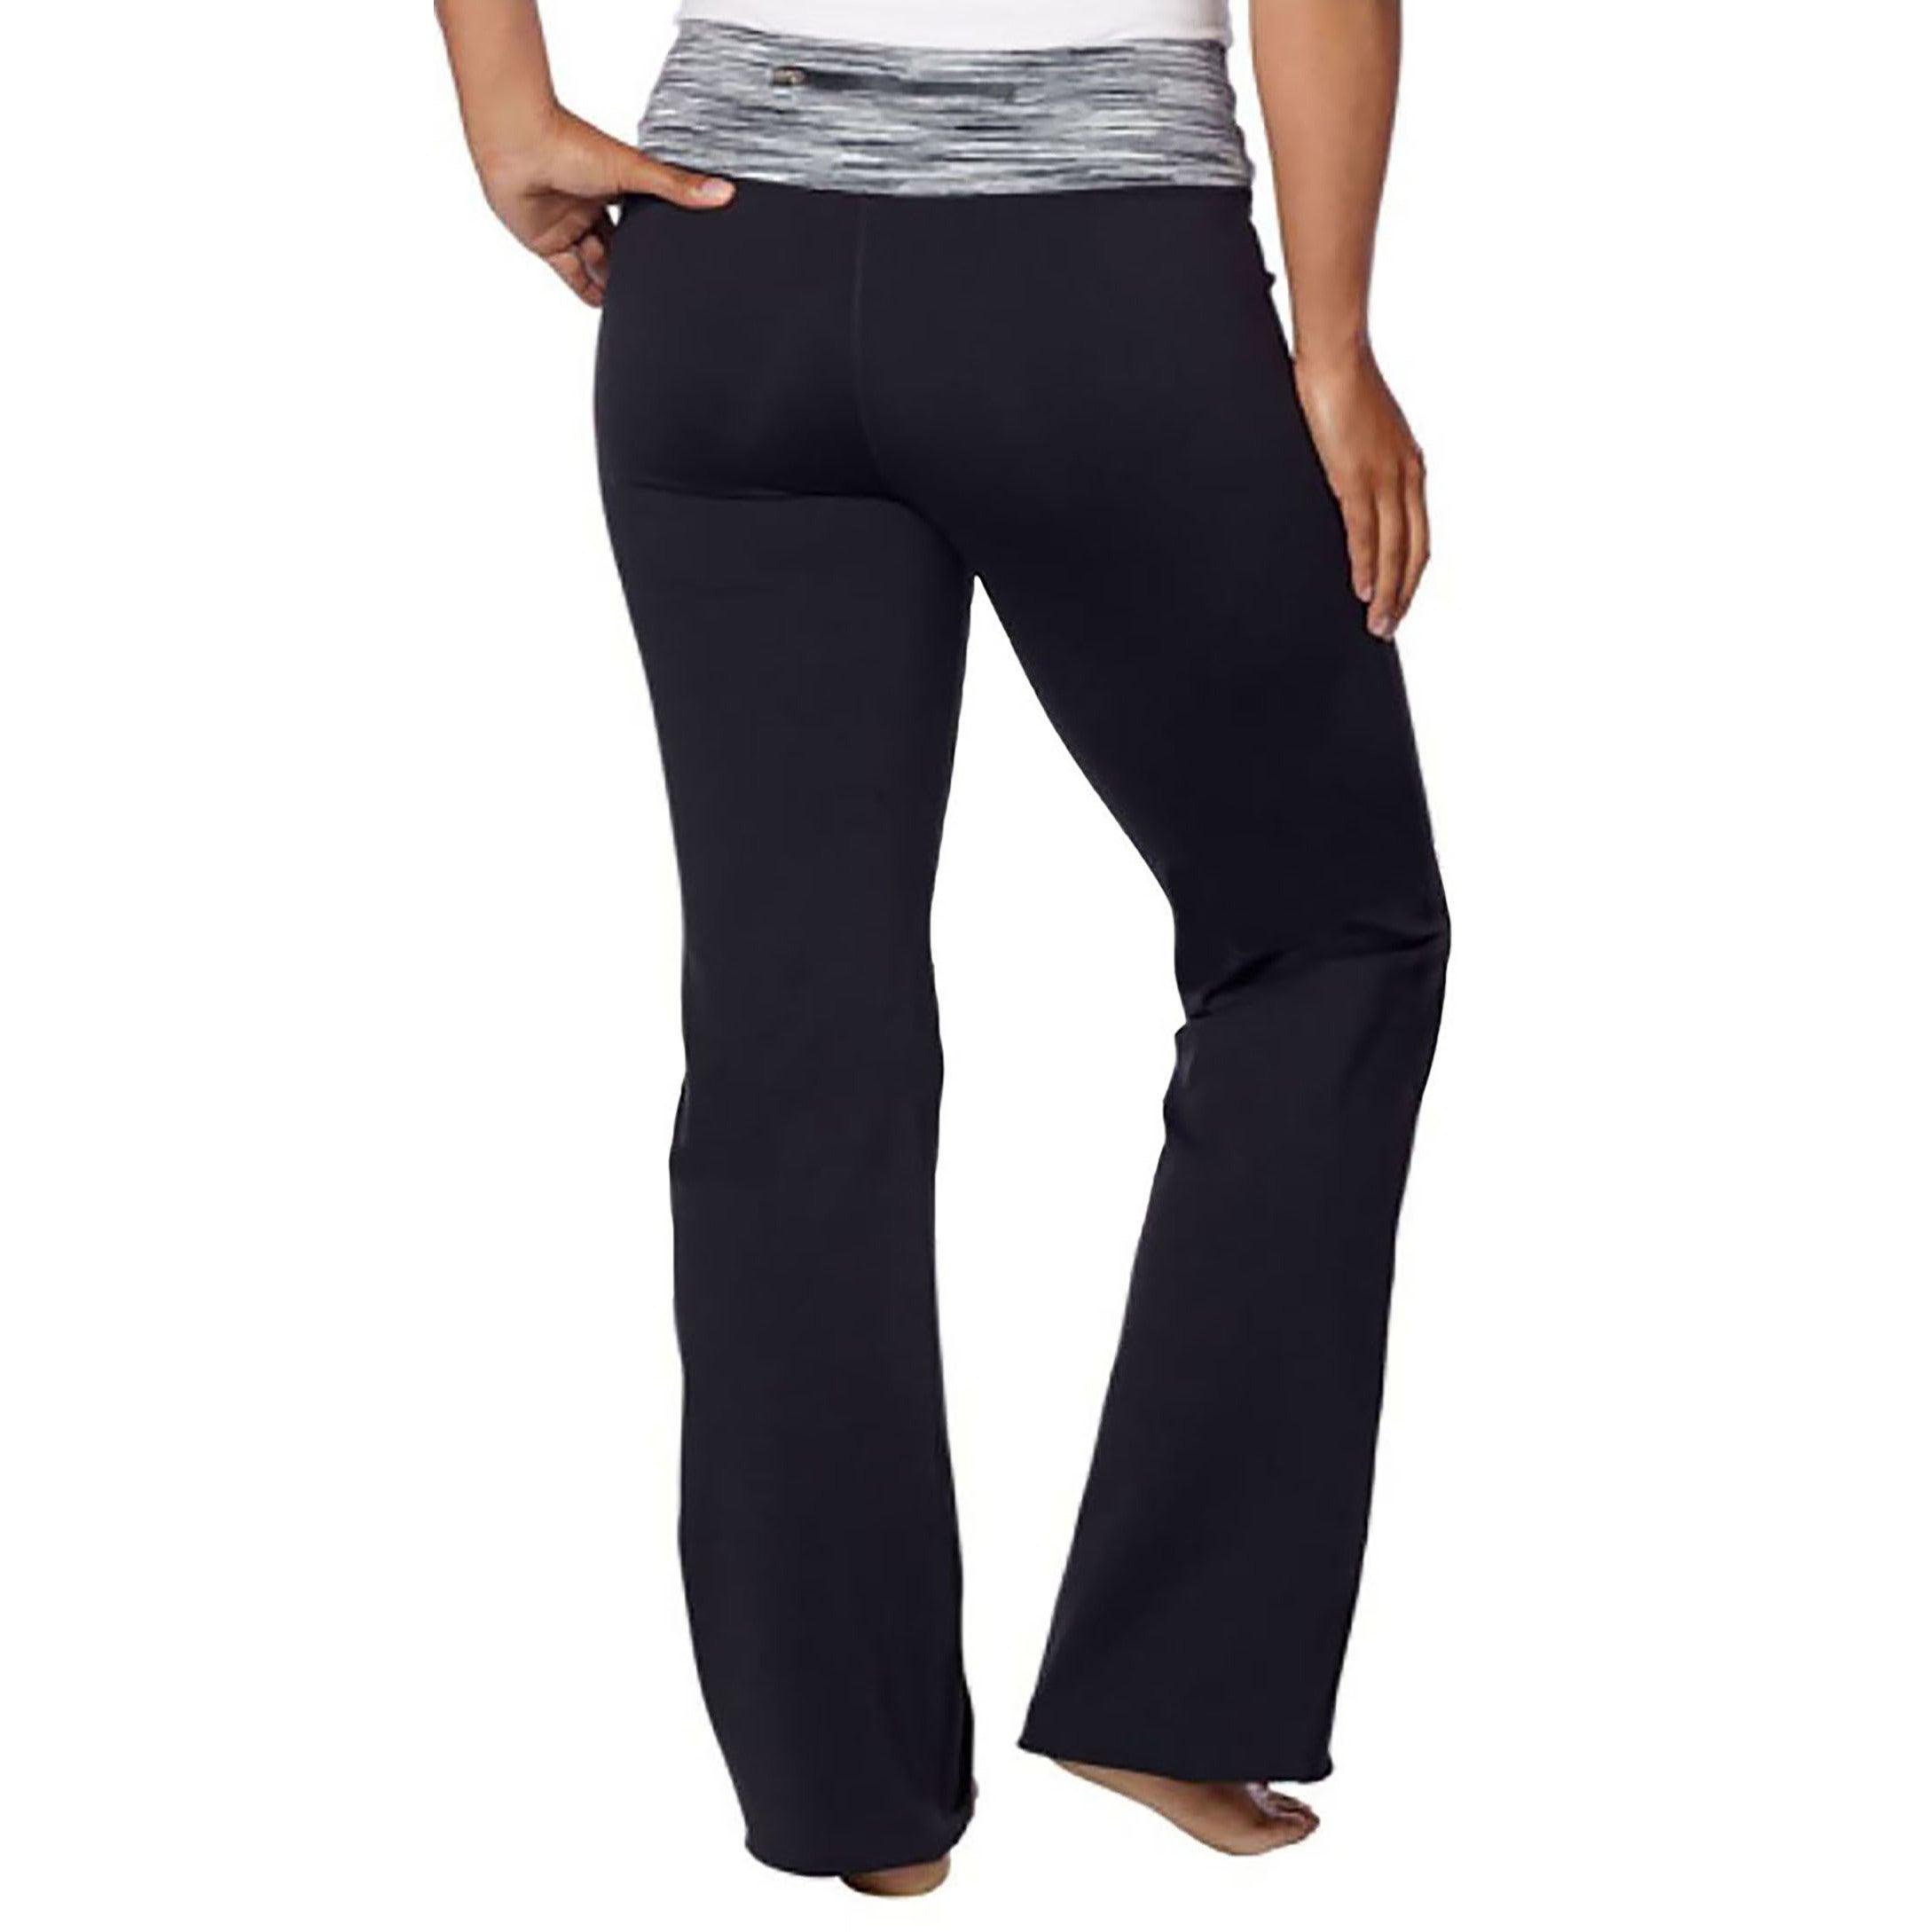 3138509e338b1 Shop Kirkland Signature Women's Full Length Stretch Yoga Athletic Pant -  Ships To Canada - Overstock - 16077829